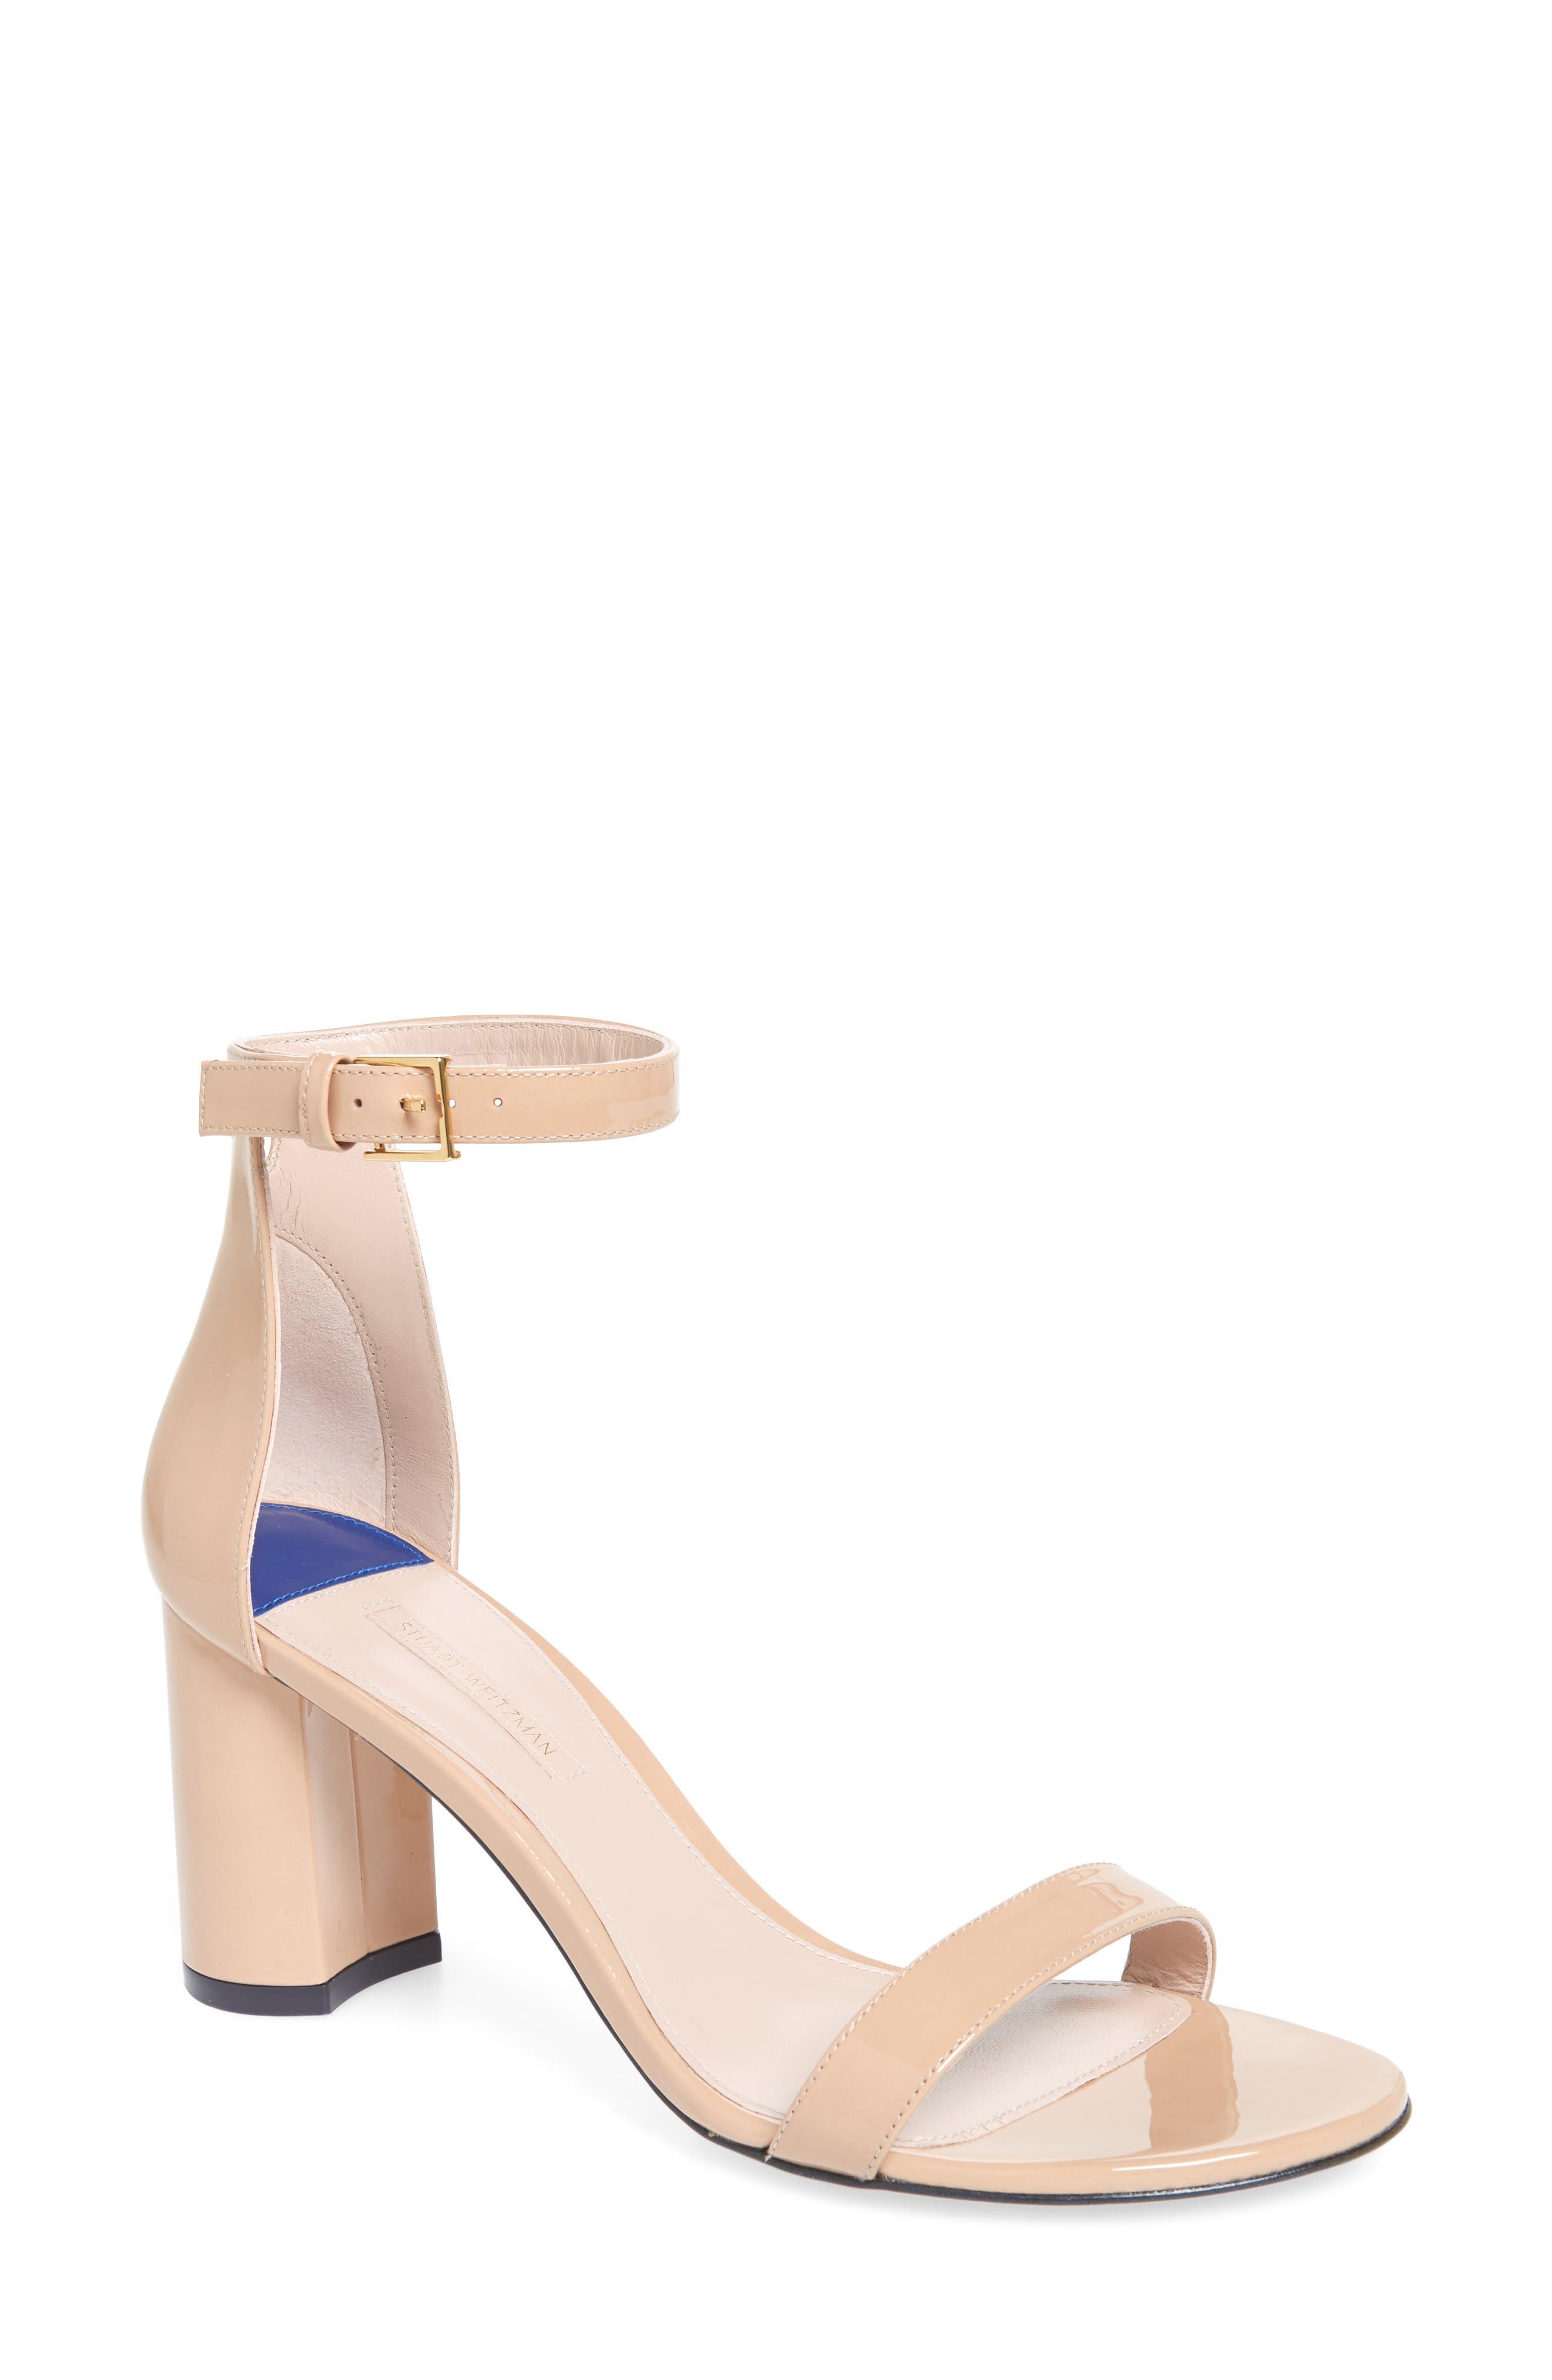 75LESSNUDIST Ankle Strap Sandal,                         Main,                         color, ADOBE CRISTAL